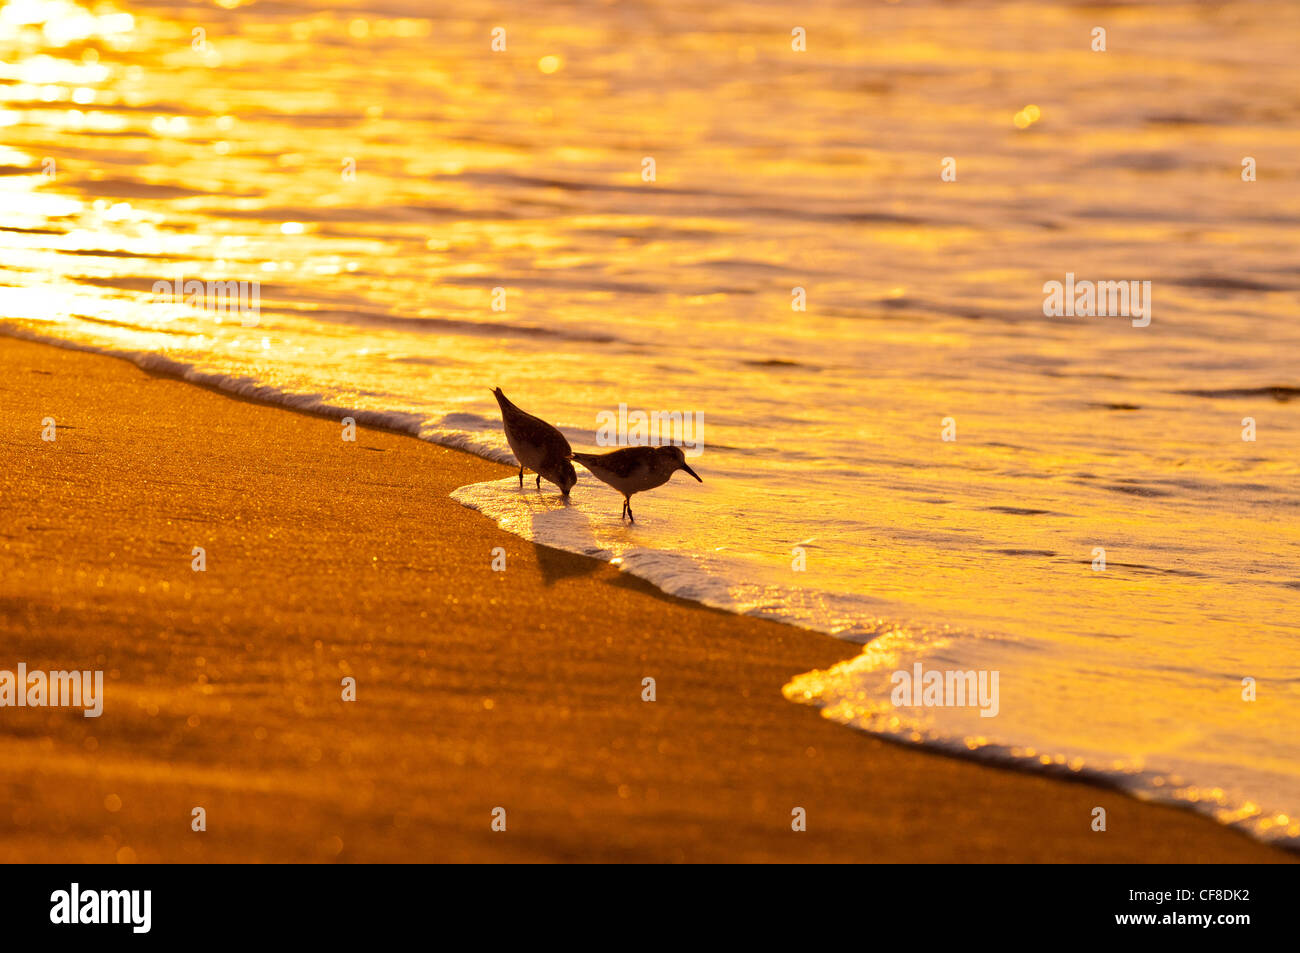 Sanderlinge-'Hunakai' in der hawaiianischen Sprache (Calidris Alba), Polihale Beach, Kauai, Hawaii Stockbild